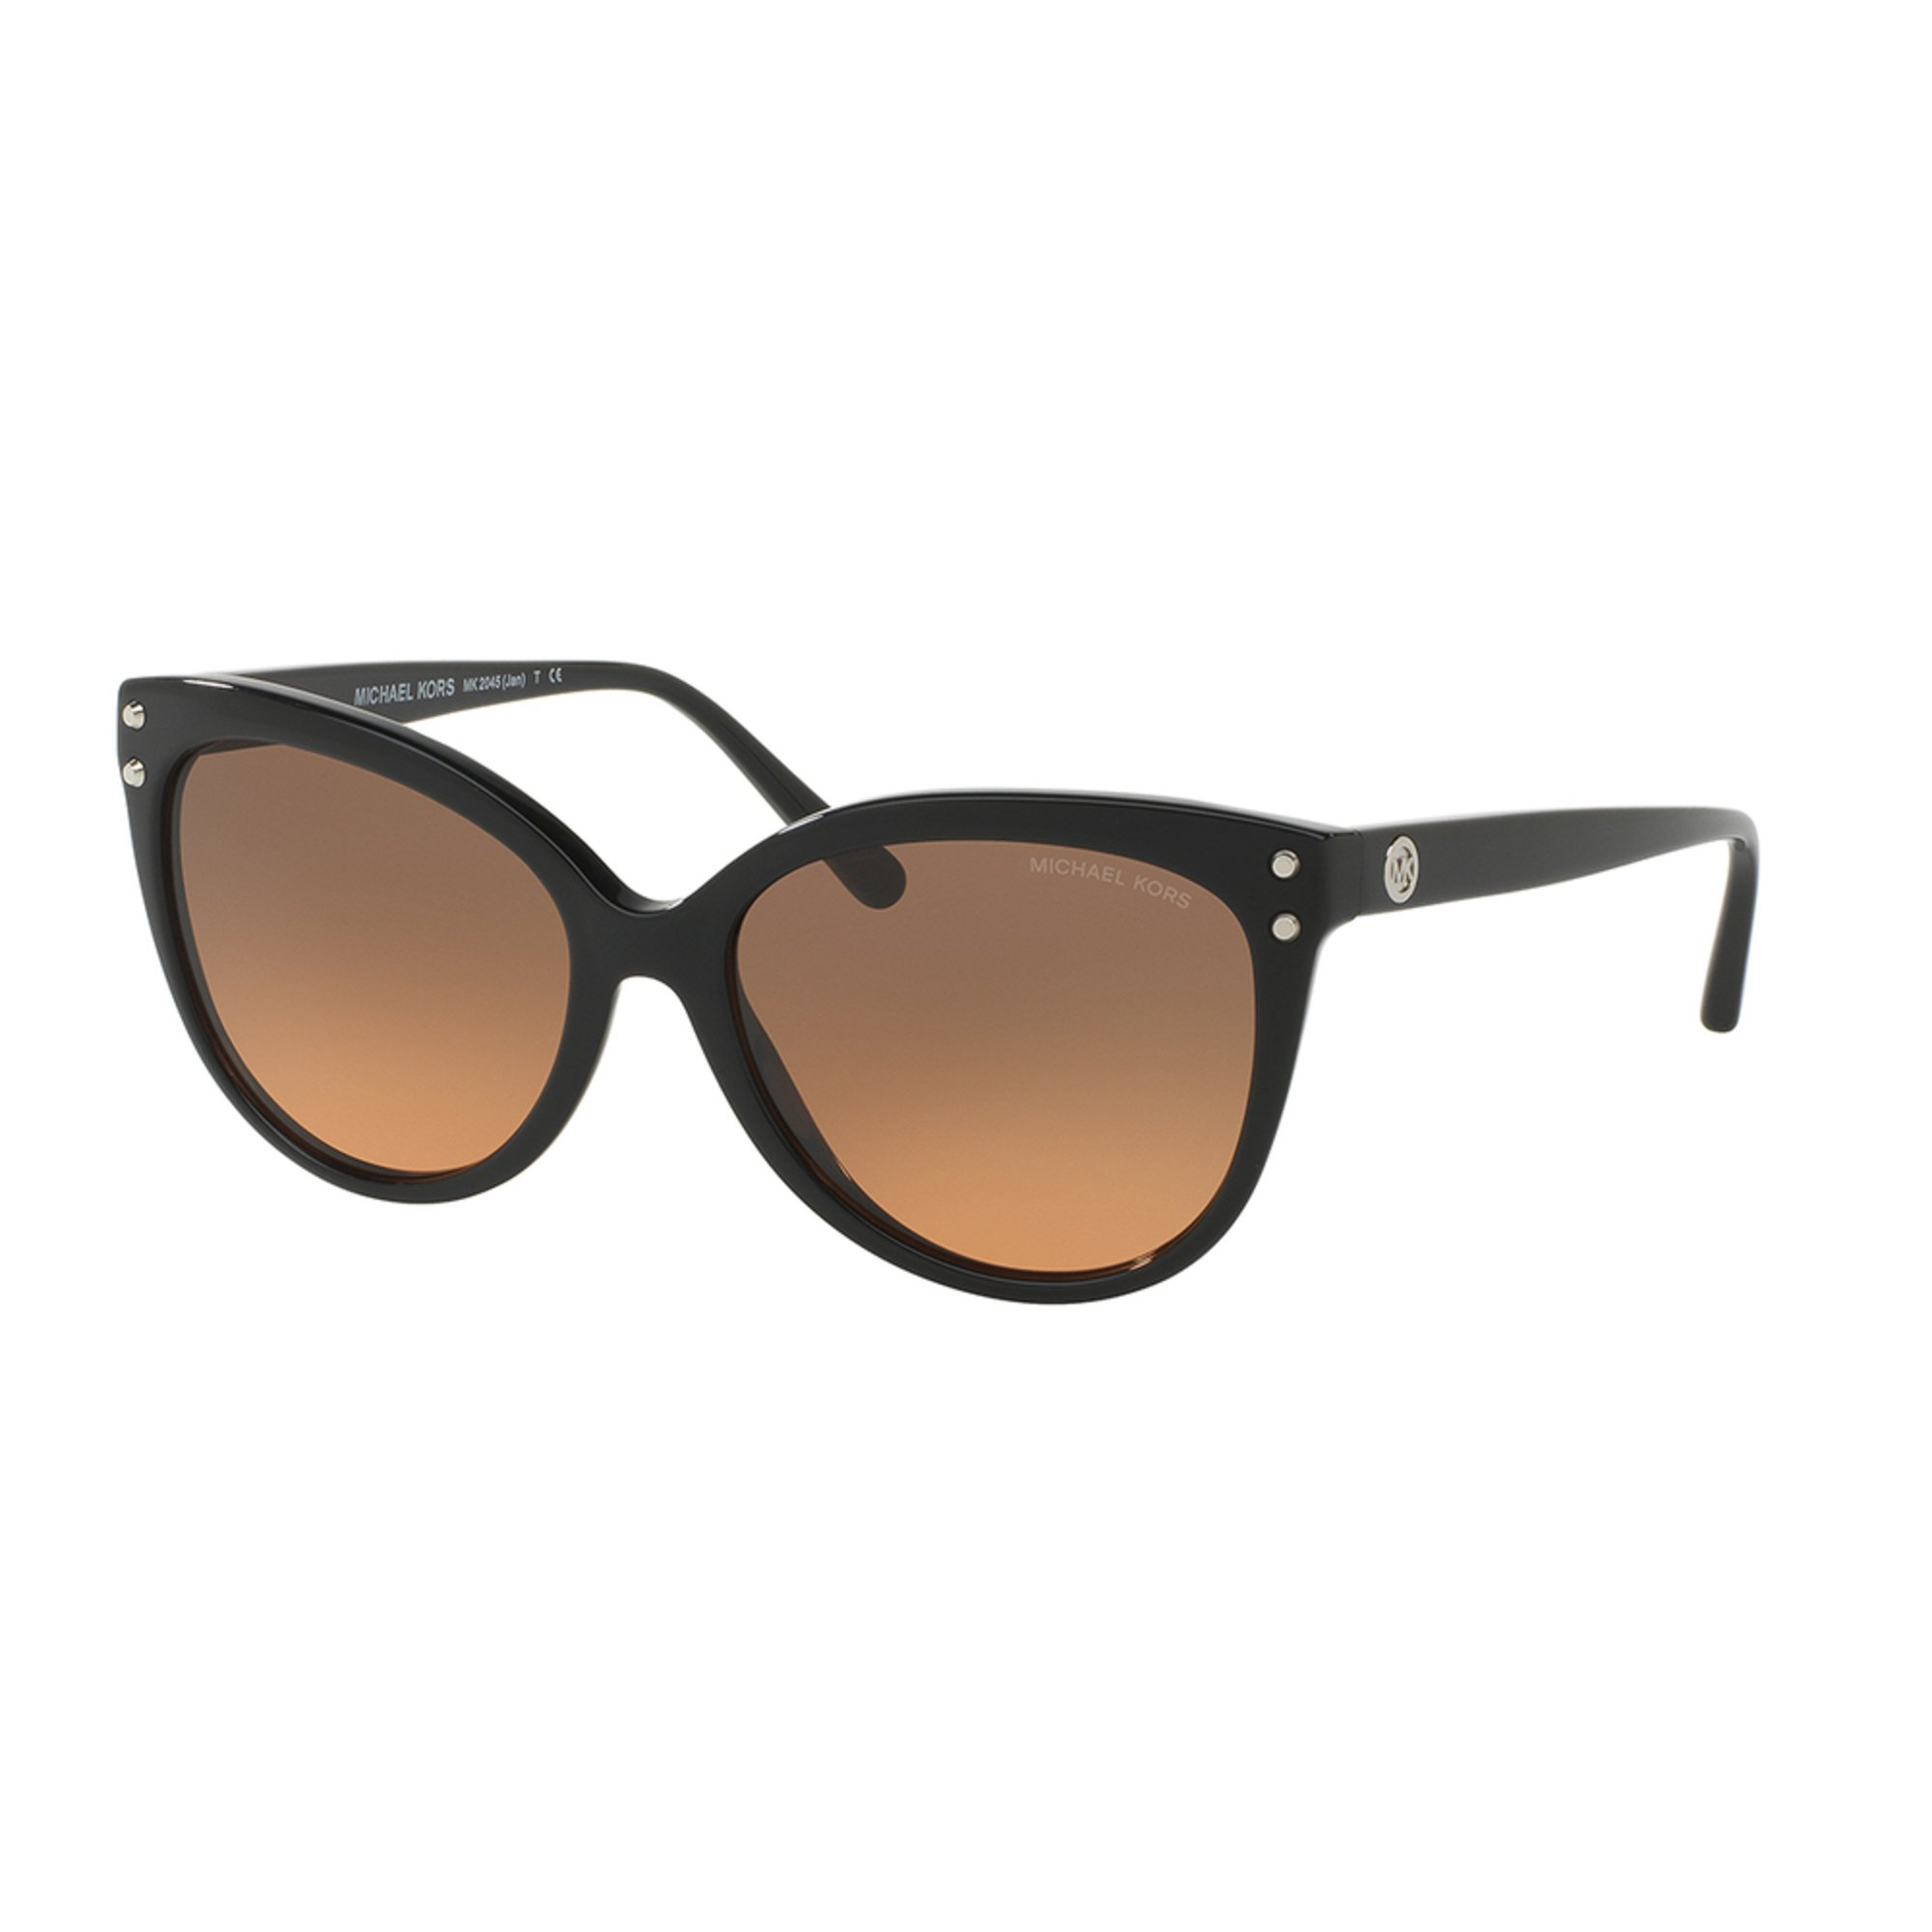 6313646b72 Michael Kors Women s Jan Sunglasses